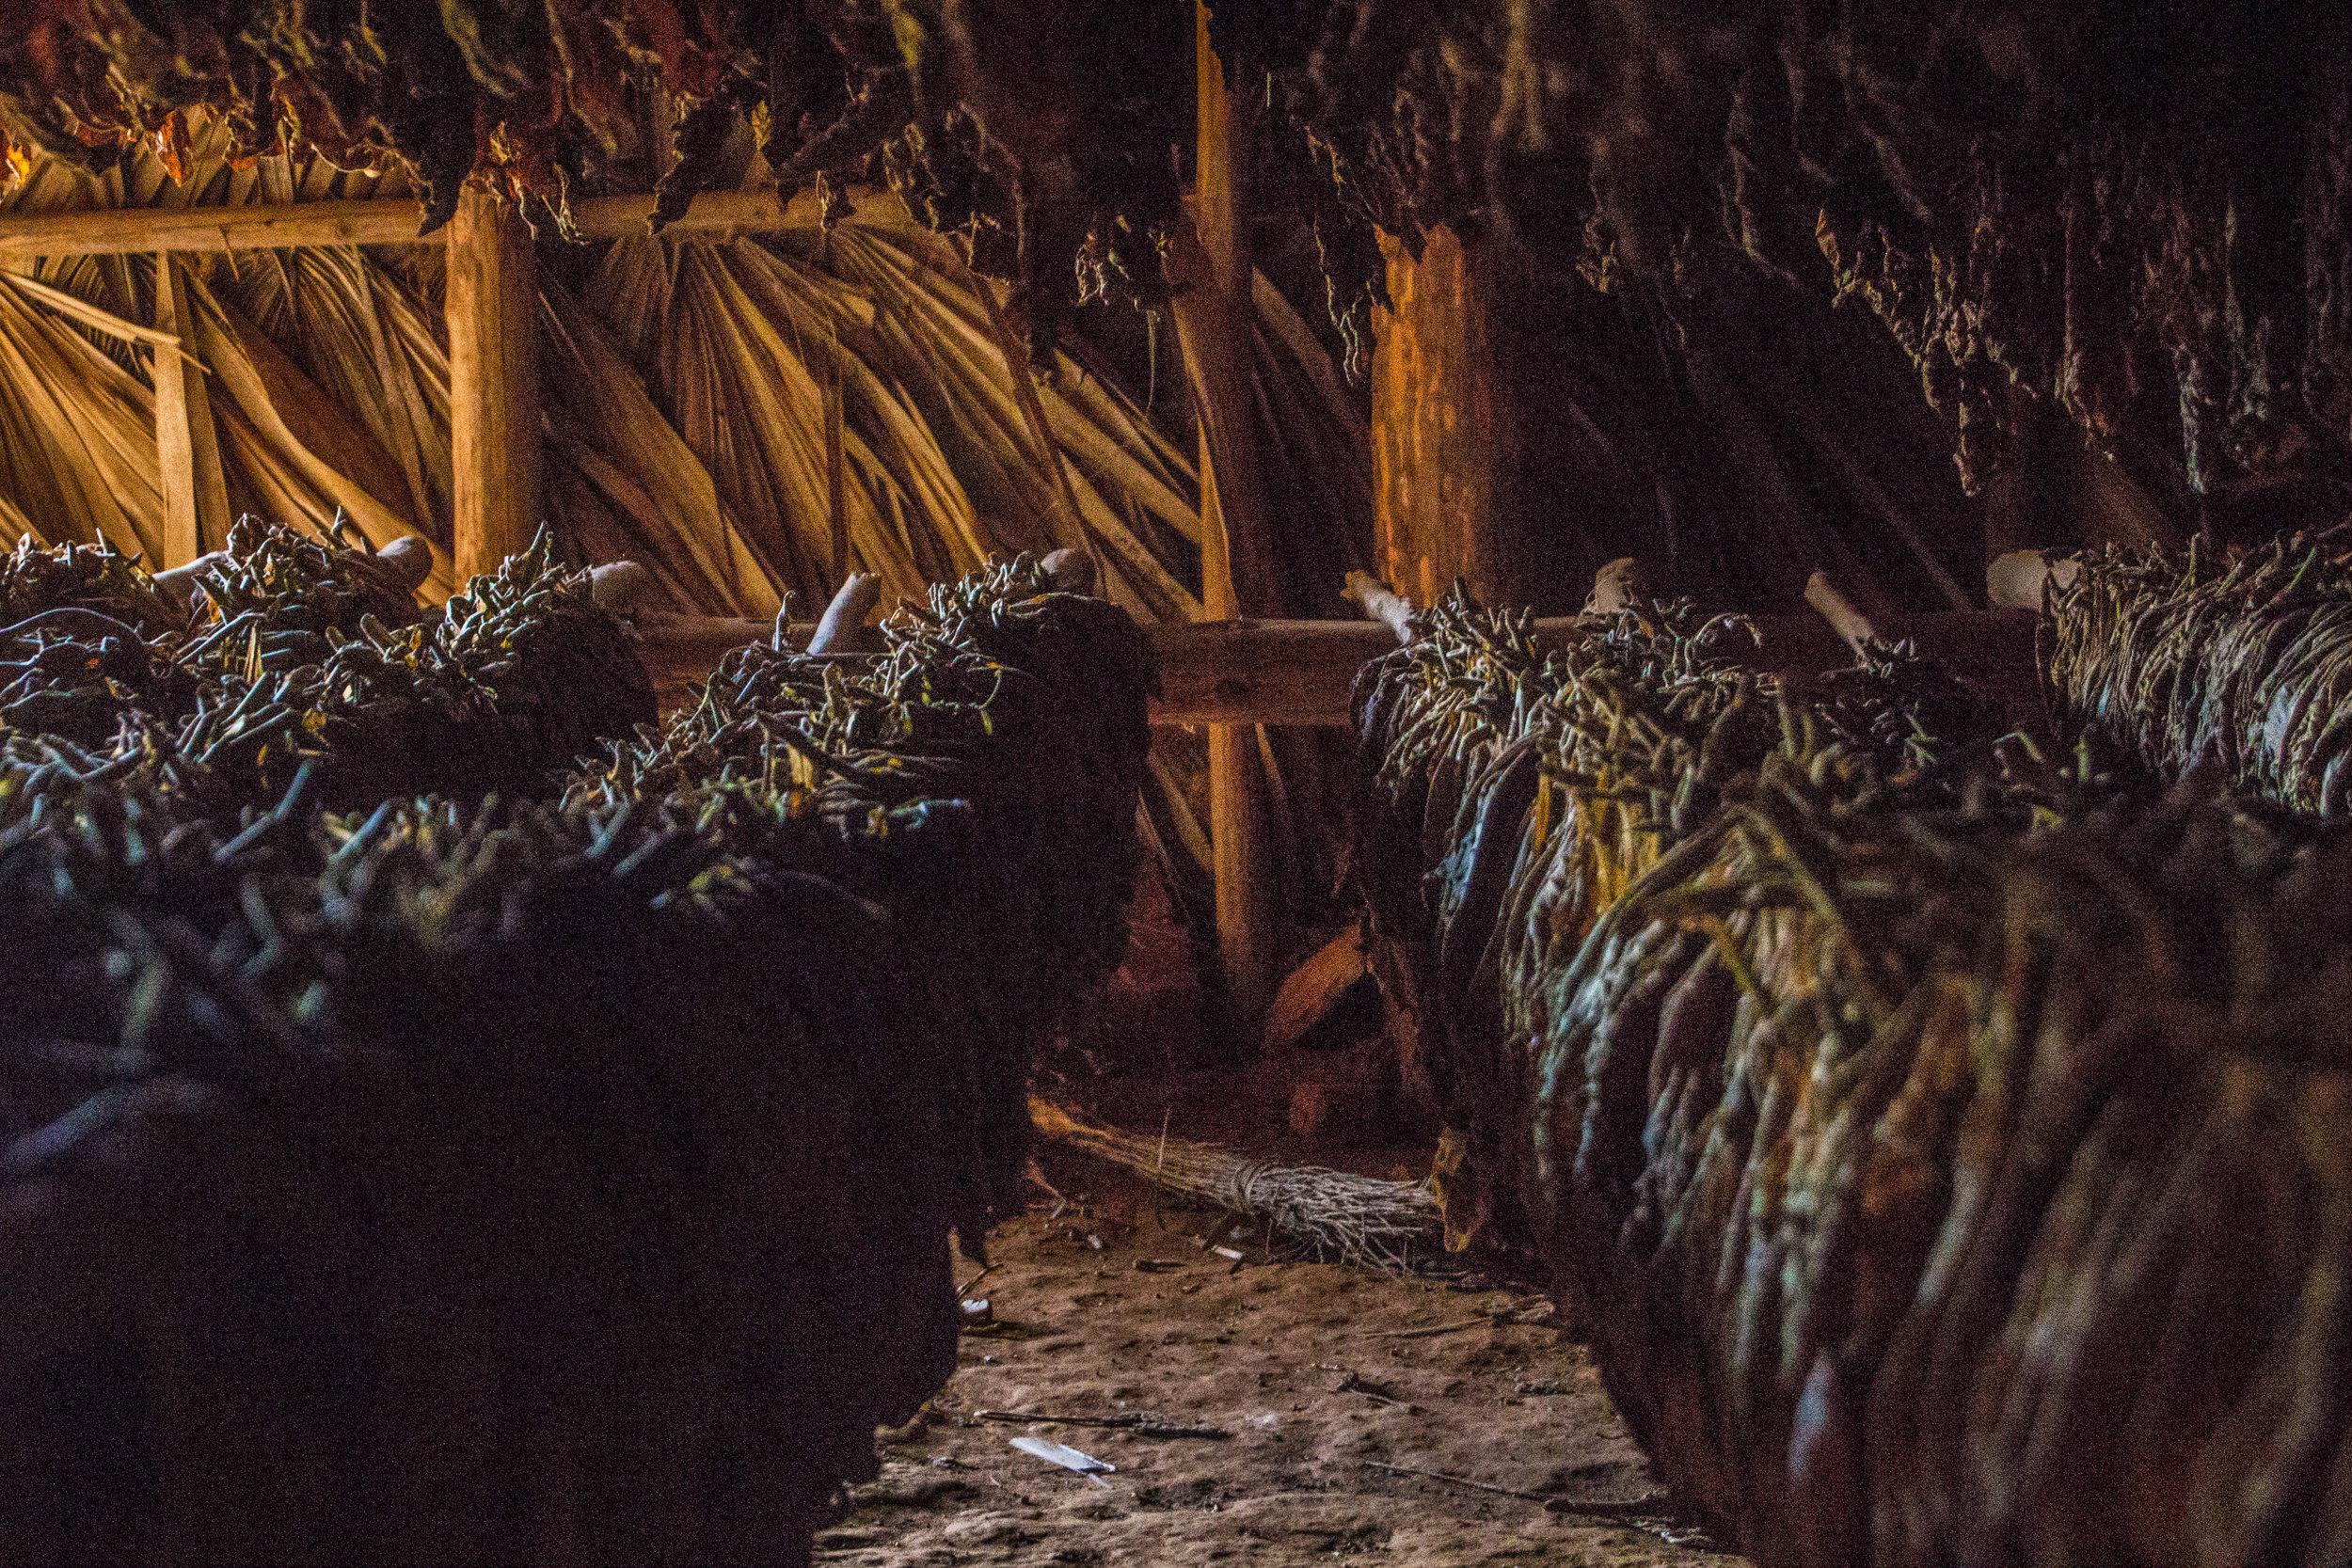 inside tobacco houses viñales cuba-1-2-2.jpg